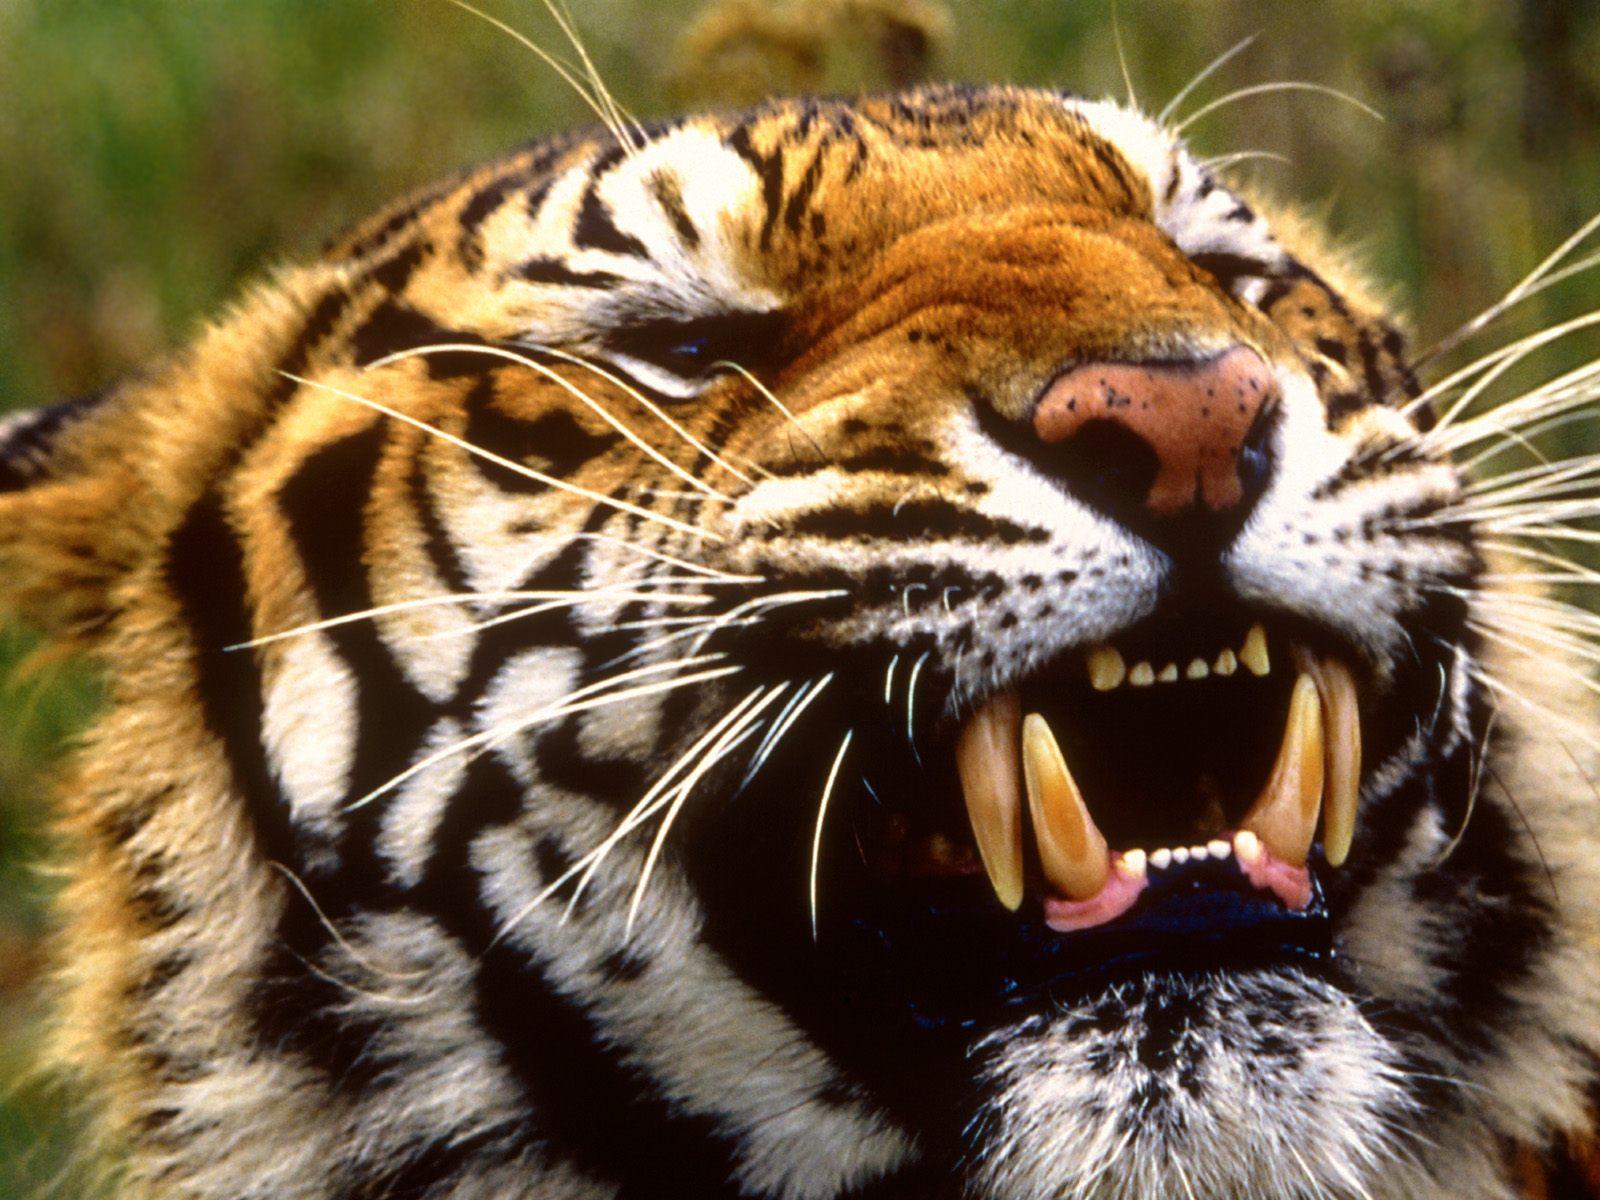 Japan Tigers HD Wallpapers Tiger Wallpaper for Desktop 1600x1200